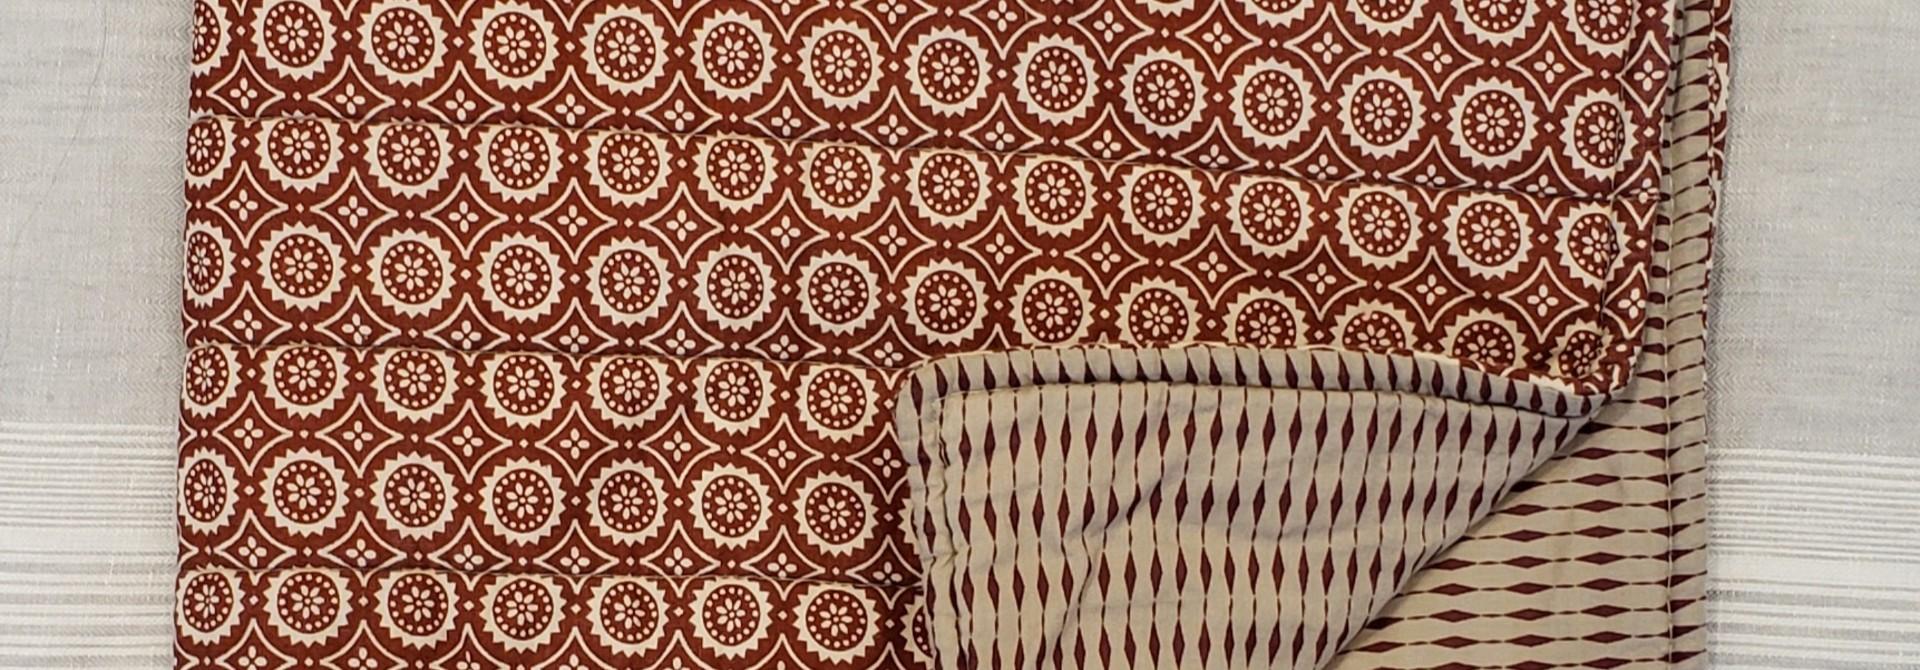 Cushion Covers - Rust - Set of 3